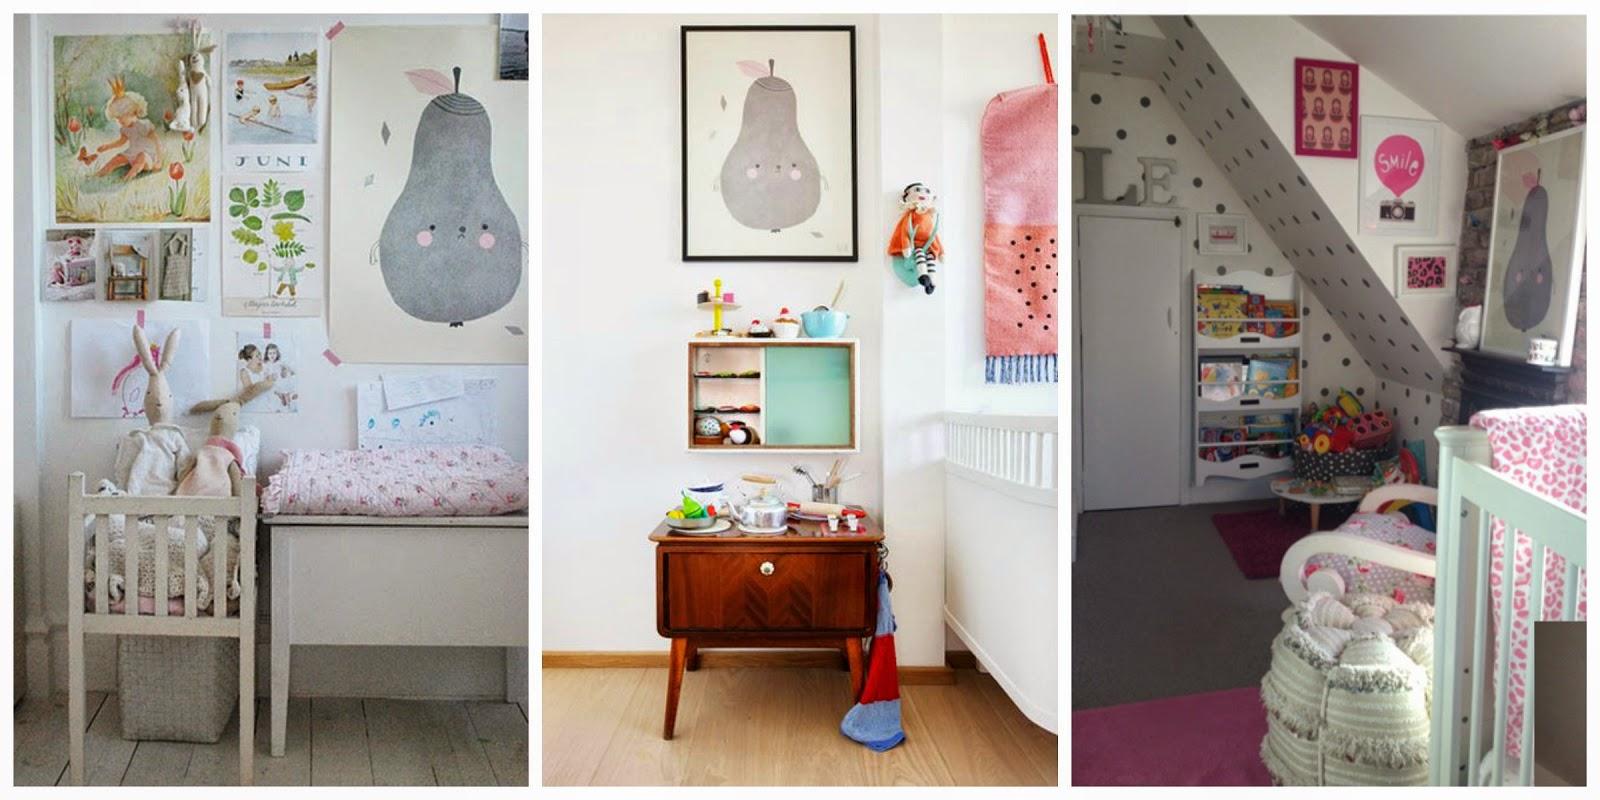 Pinterest | Bedroom Buys | Bedroom Style | Kids Style | Kids Bedrooms |  Kids Bedroom ...